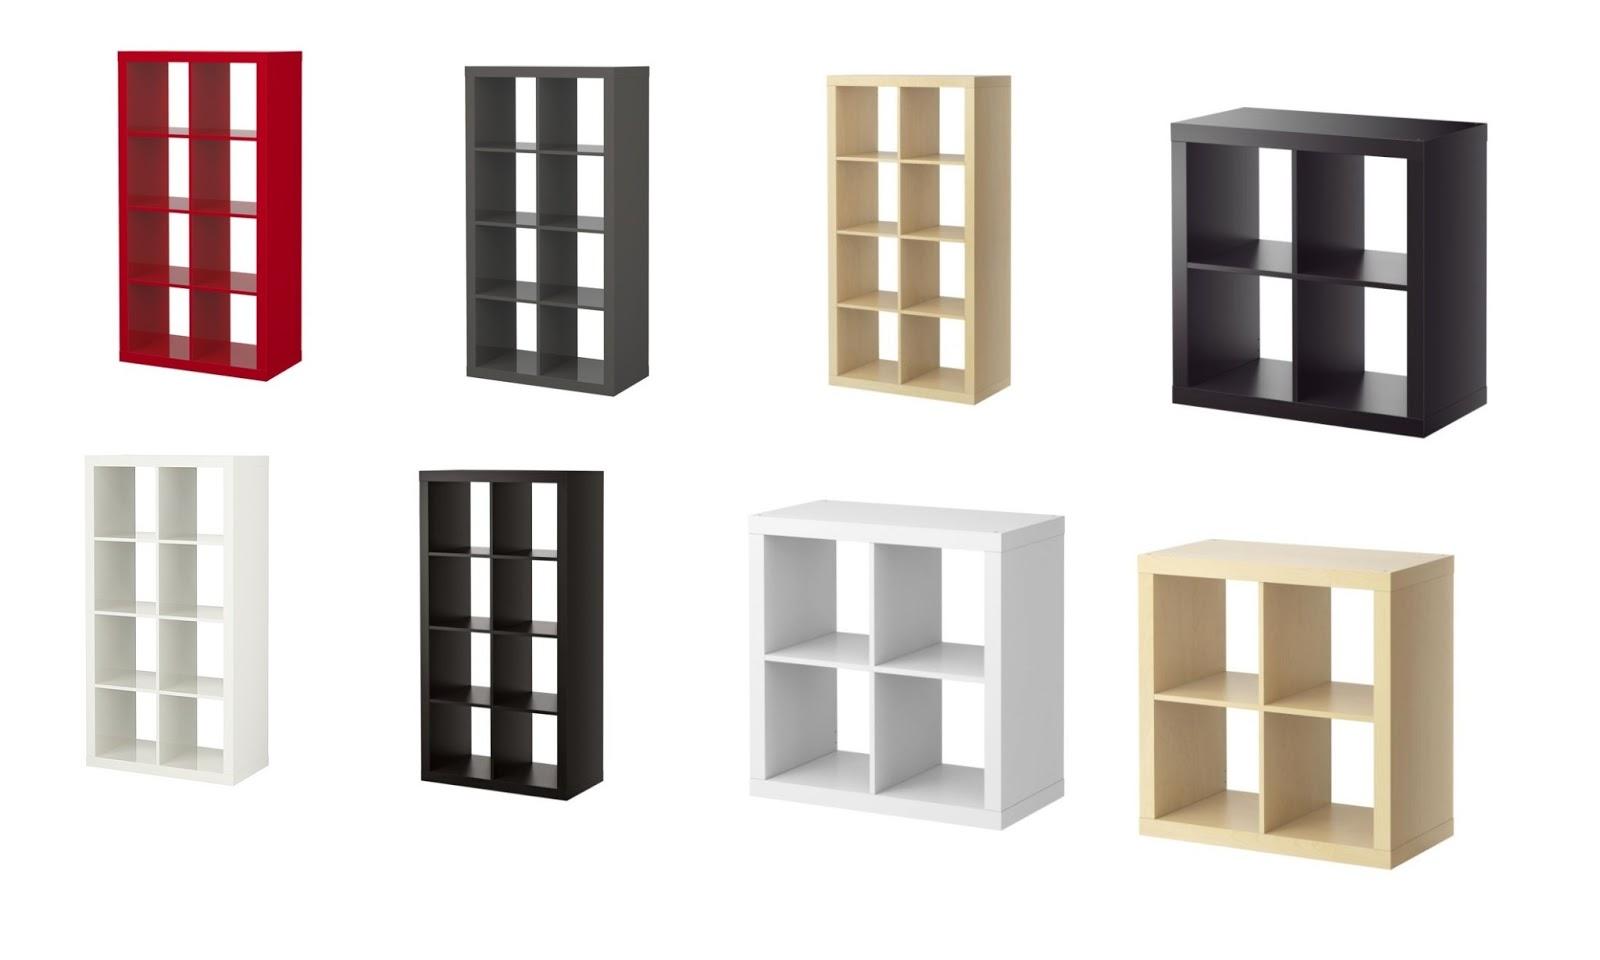 Estanterias De Pared Ikea   Ideas De Disenos   Ciboney.net